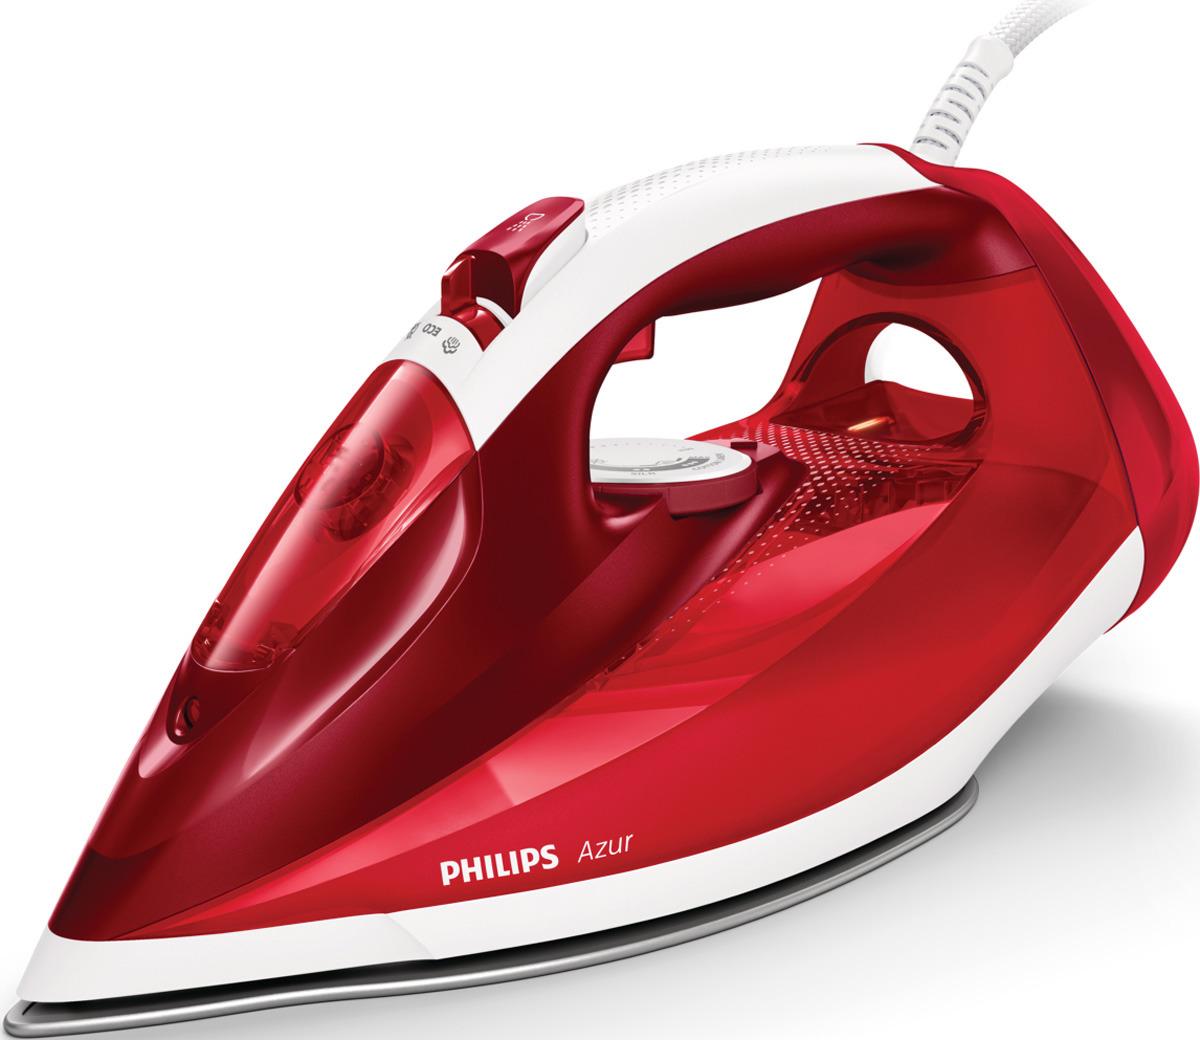 Утюг Philips Azur GC4542/40 утюг philips 2500 вт удар 200г подача 45 г мин подошва steamglide plus красный белый